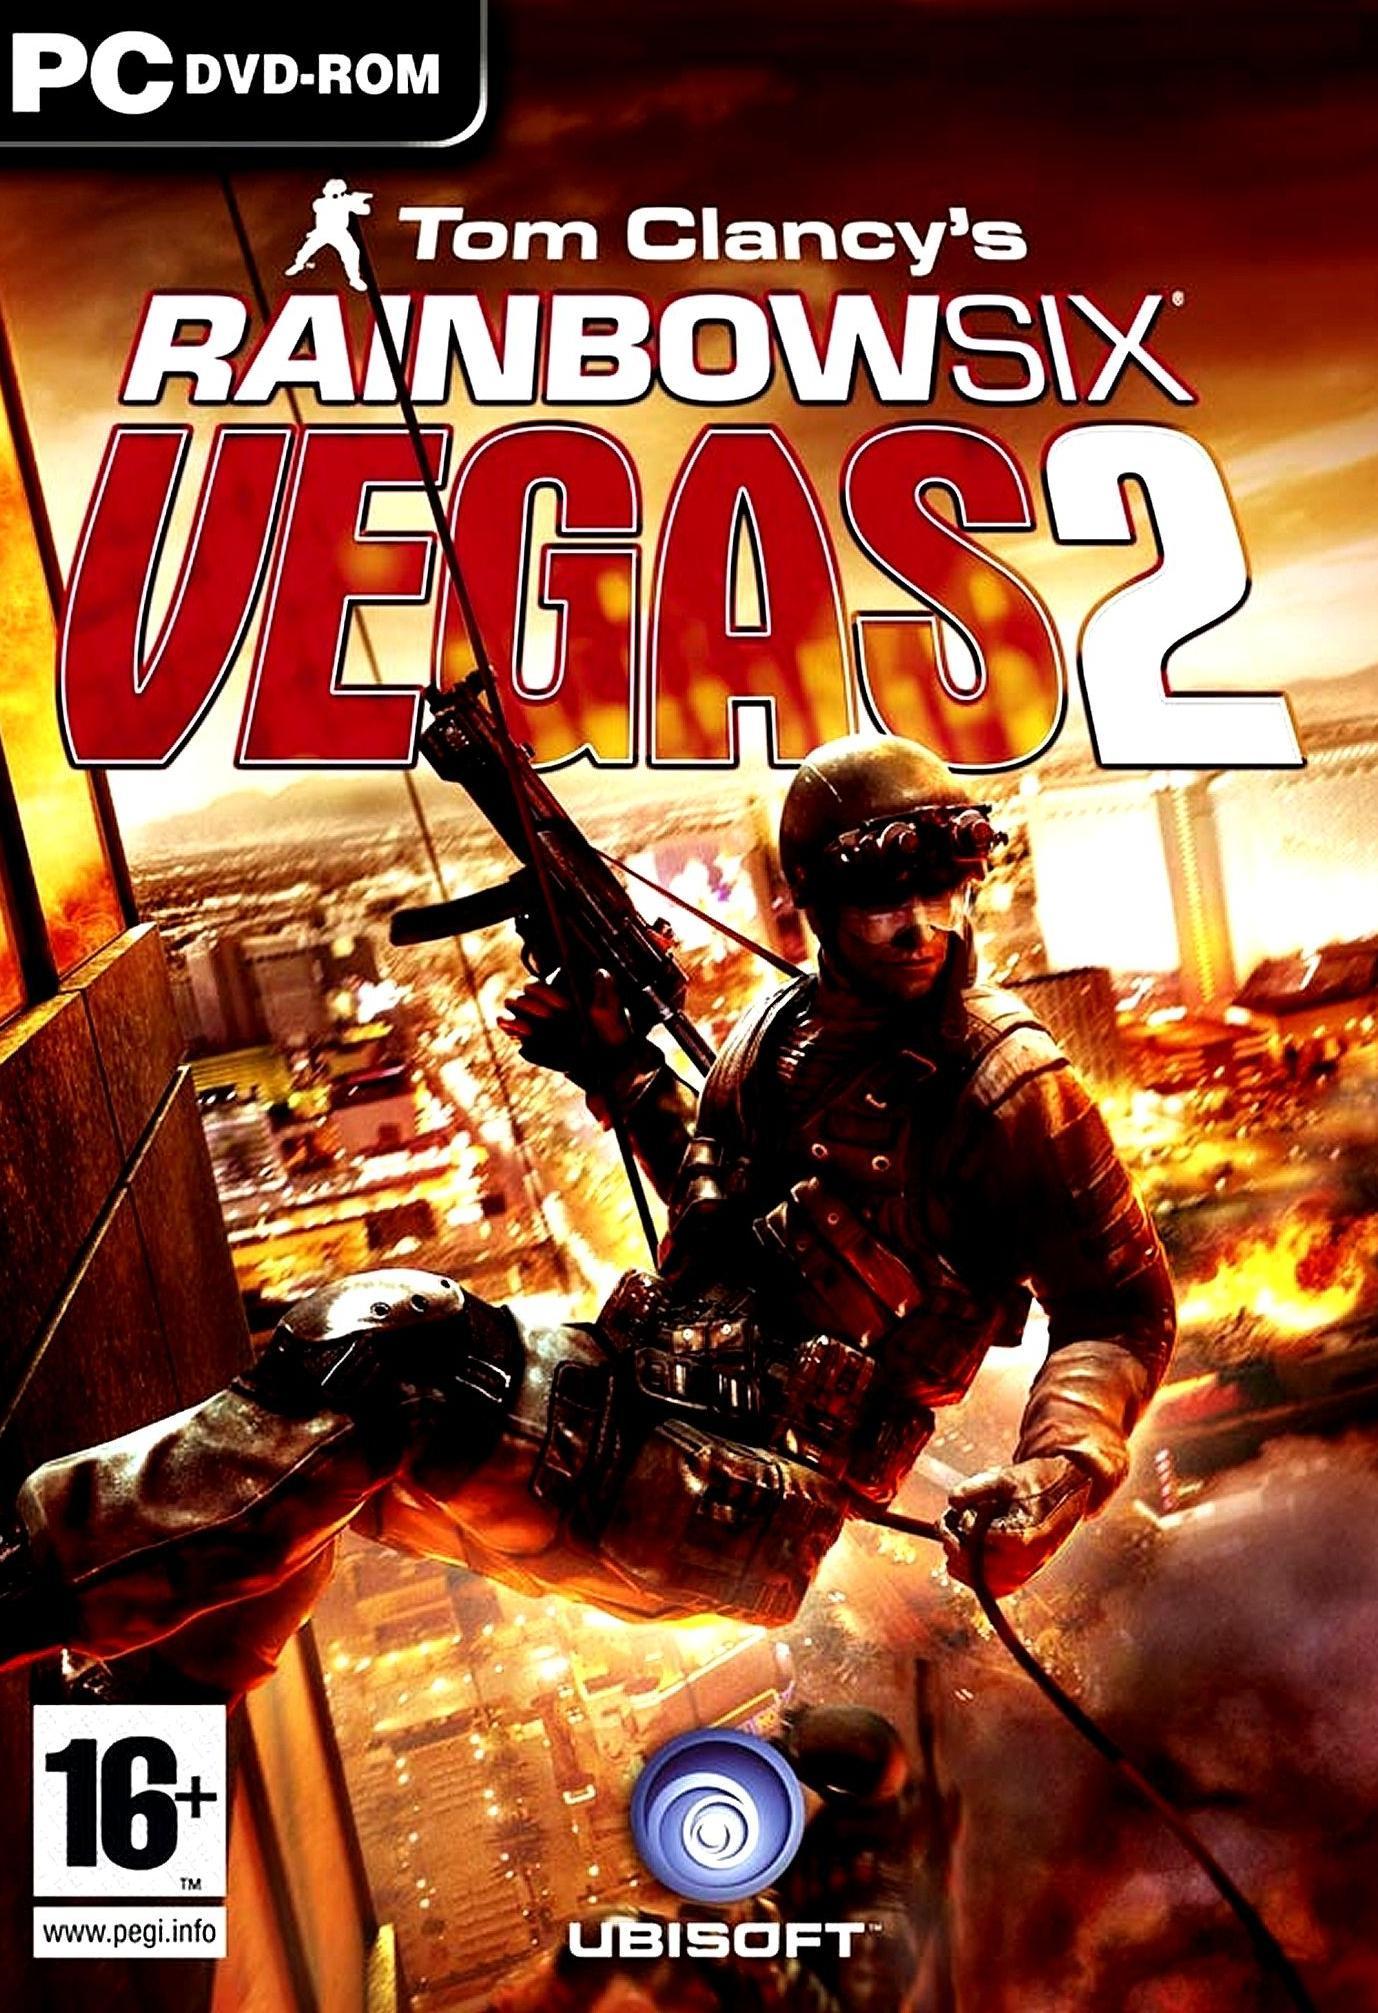 Tom Clancy's Rainbow Six: Vegas 2 (2008) RePack